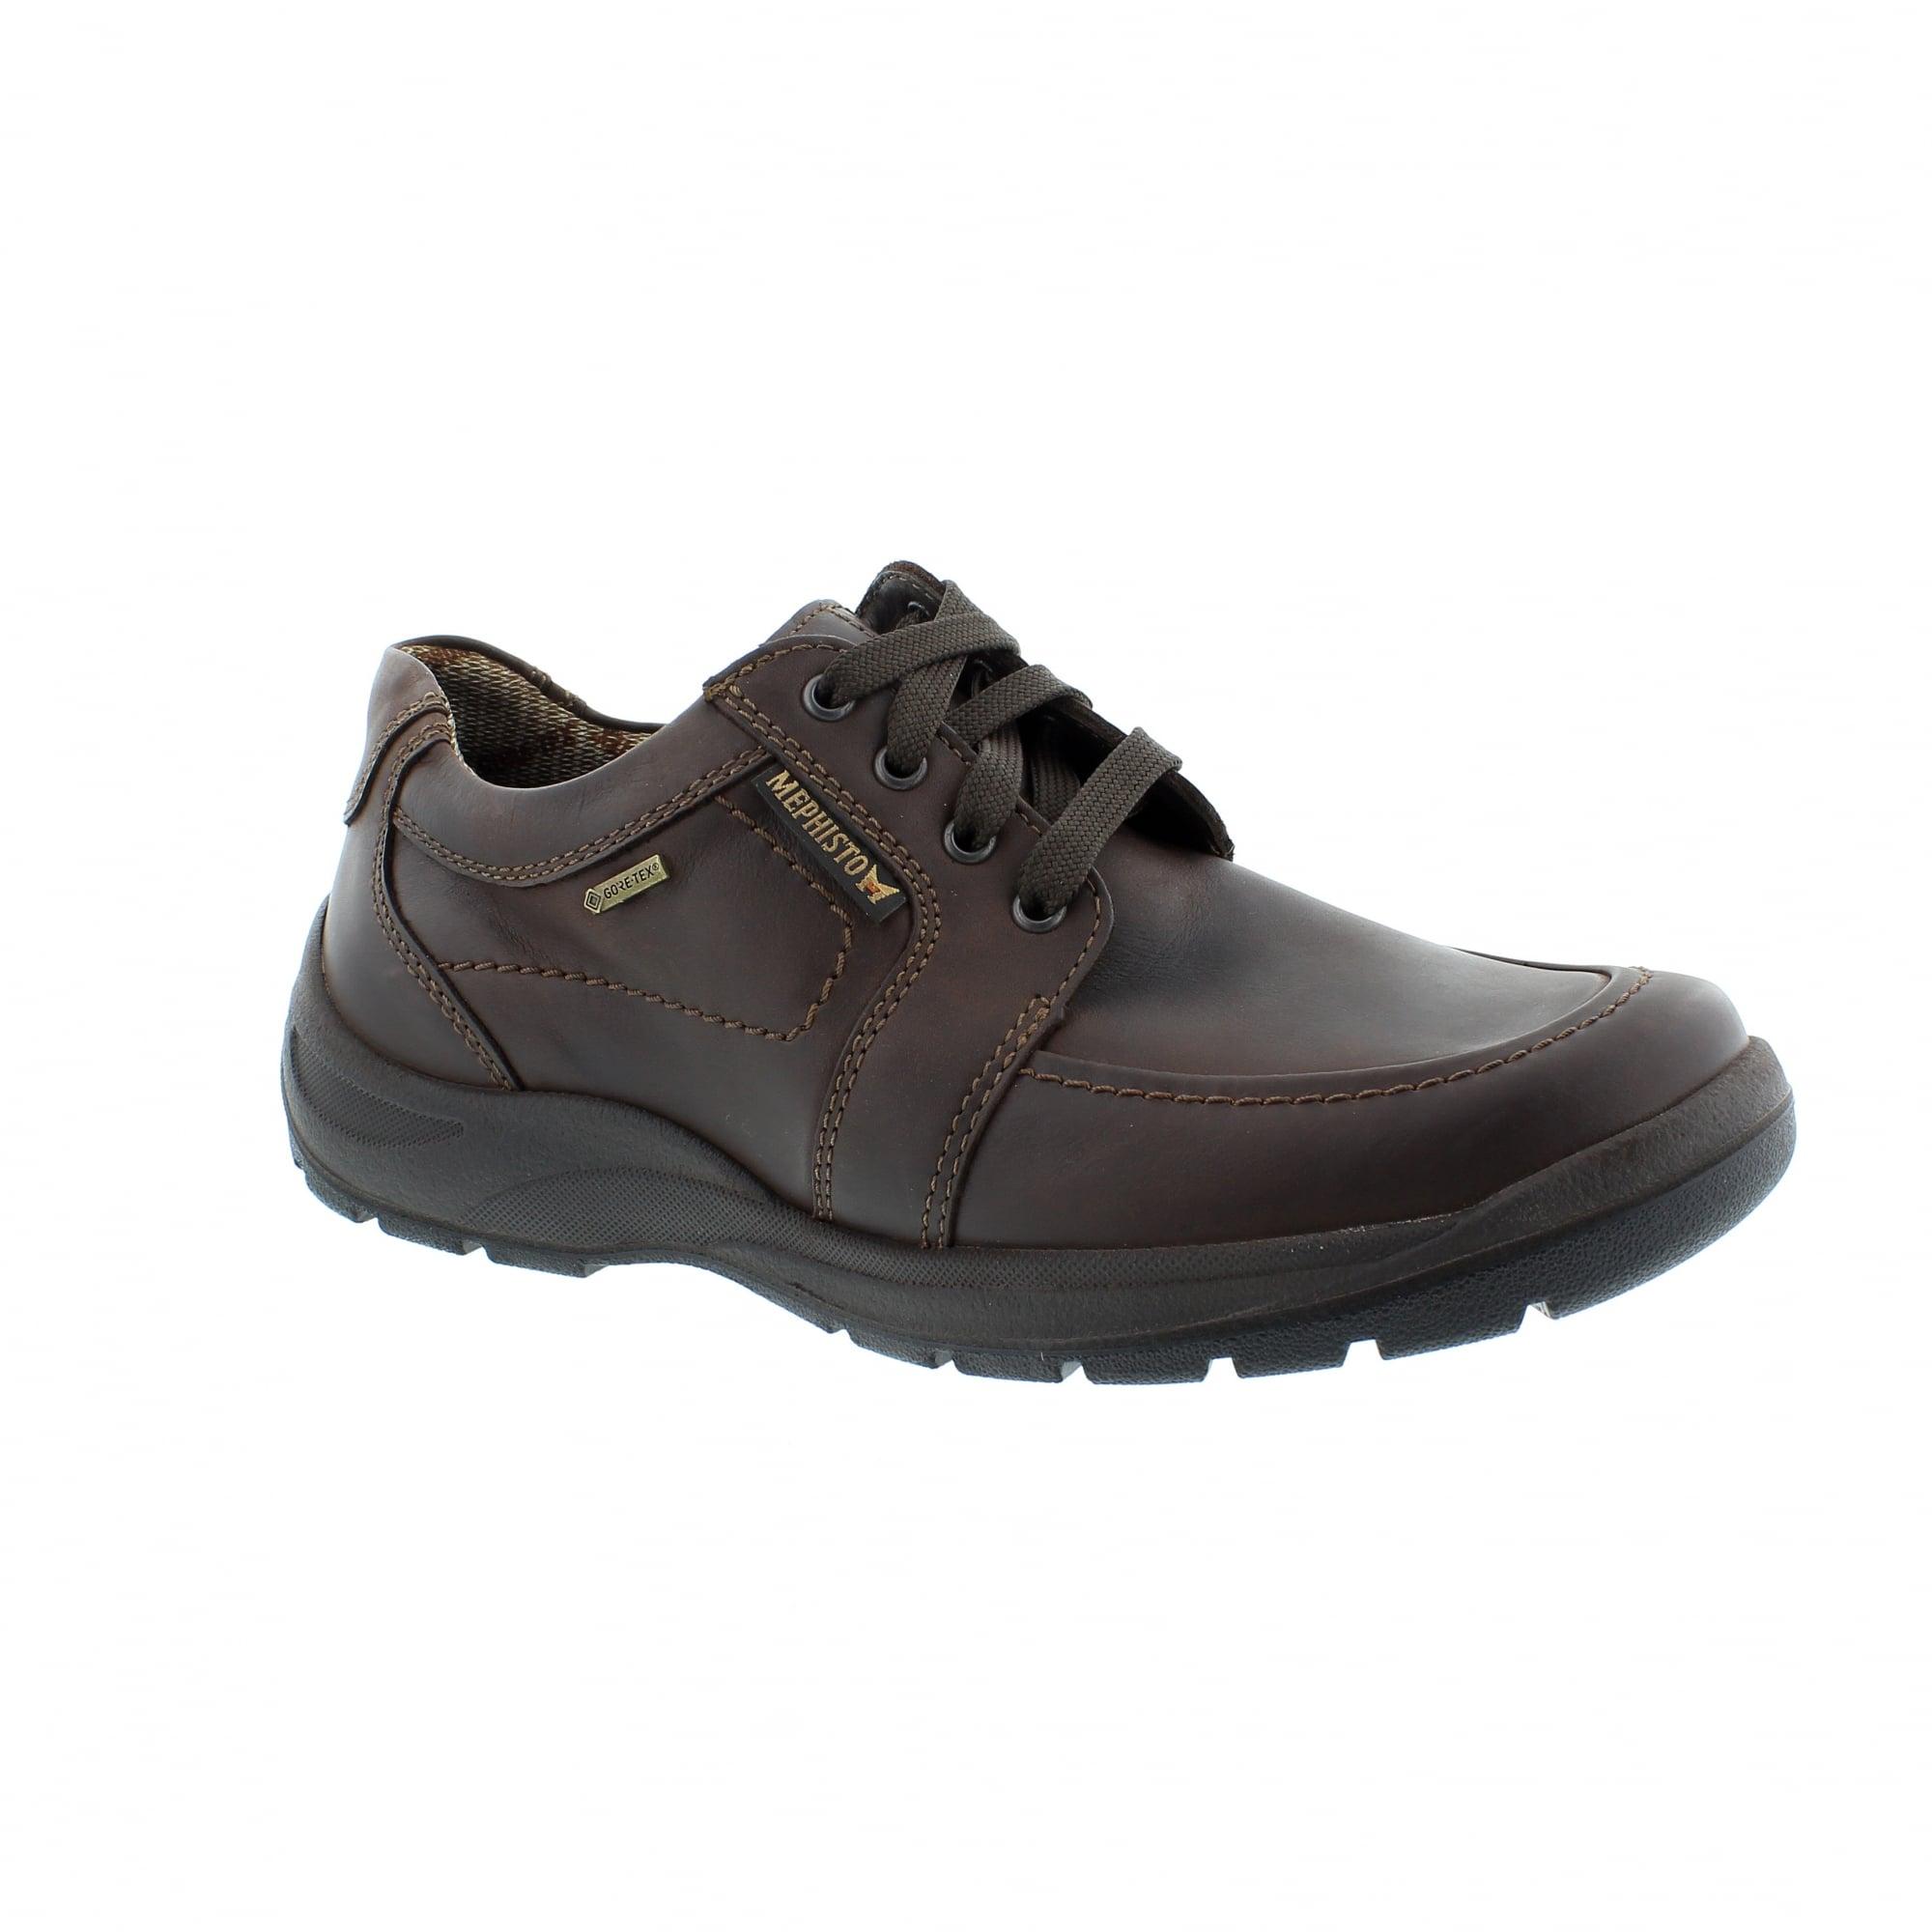 46d57d985a344e Mephisto Bristol Gt 151 Mens Walking Shoes